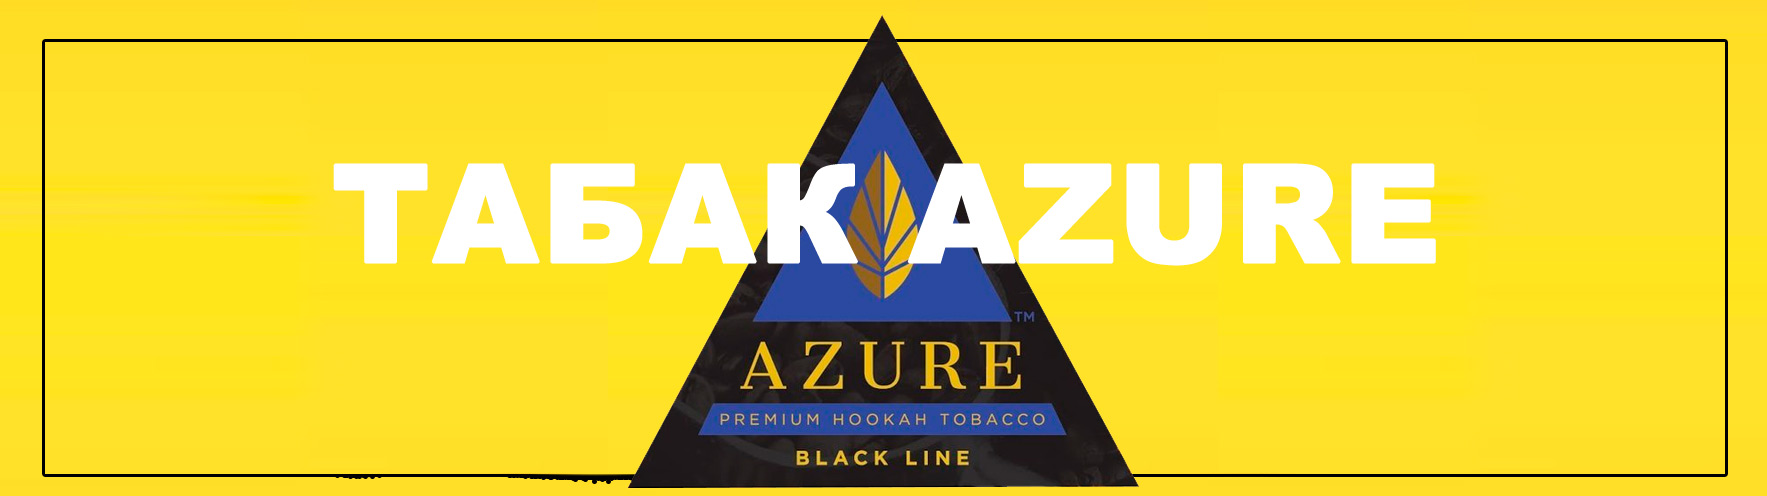 tabak dlja kaljana azure optom v ilfumo - Табак для кальяна Azure